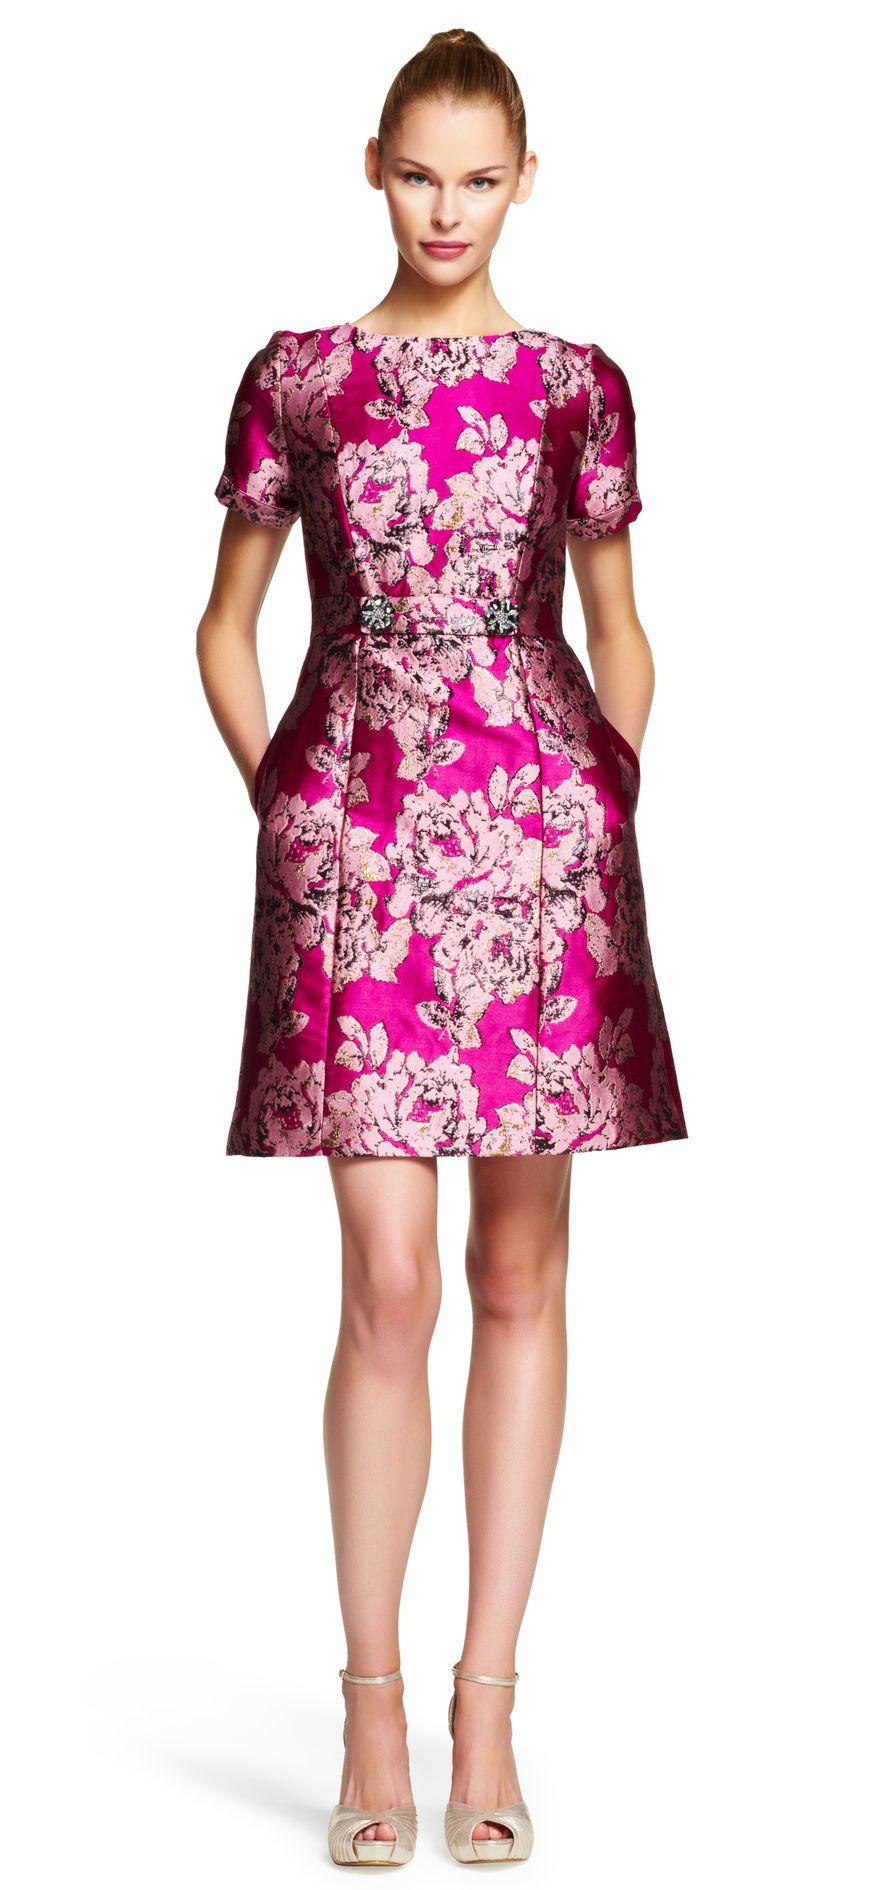 Embellished Waist Tab Metallic Jacquard Dress - Adrianna Papell ...